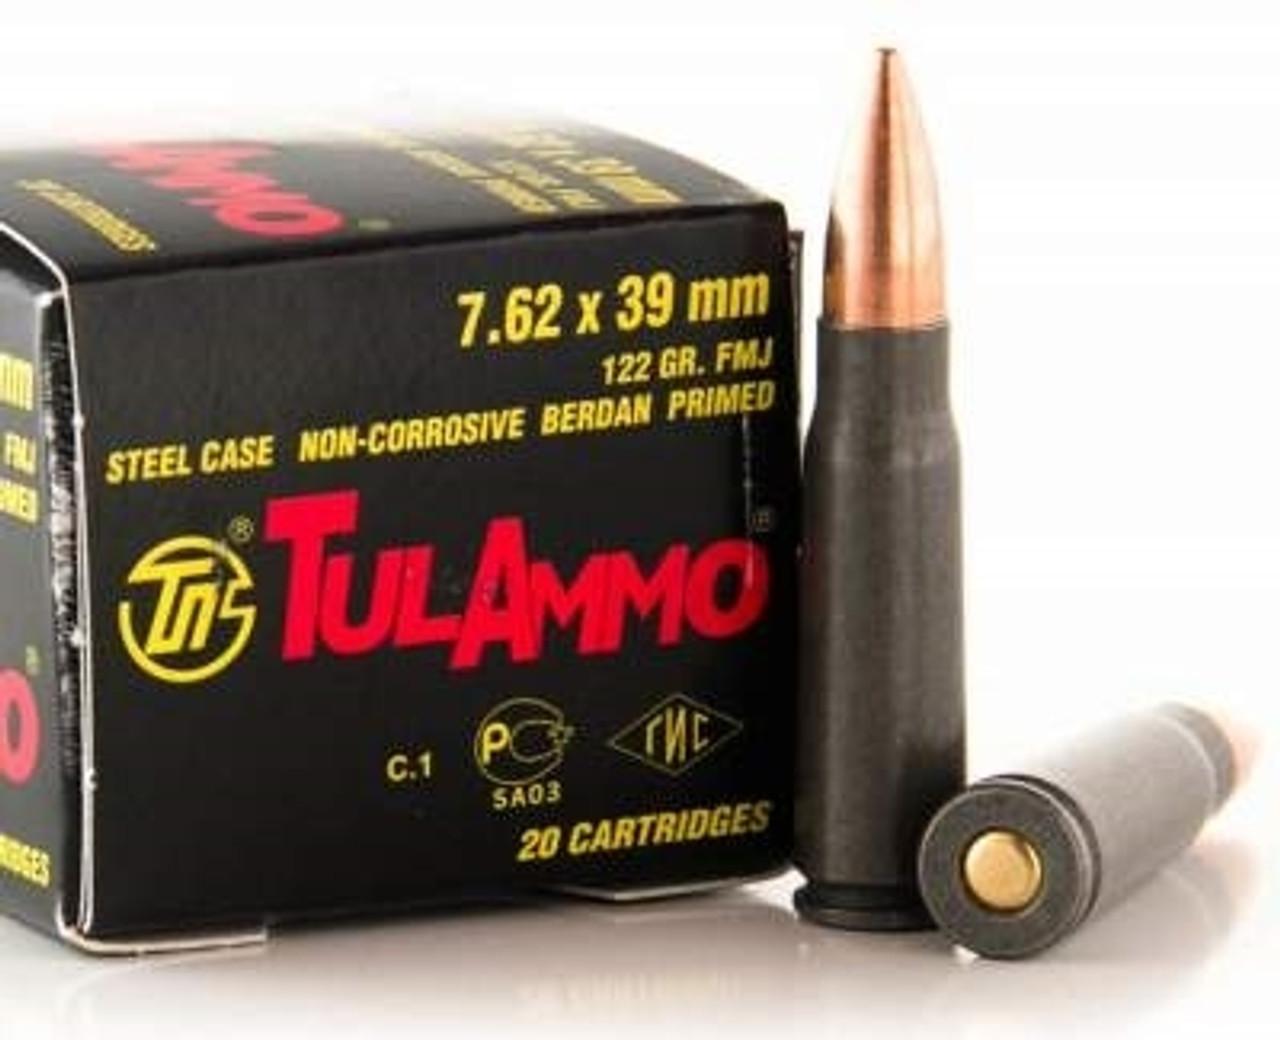 7.62x39mm Ammo